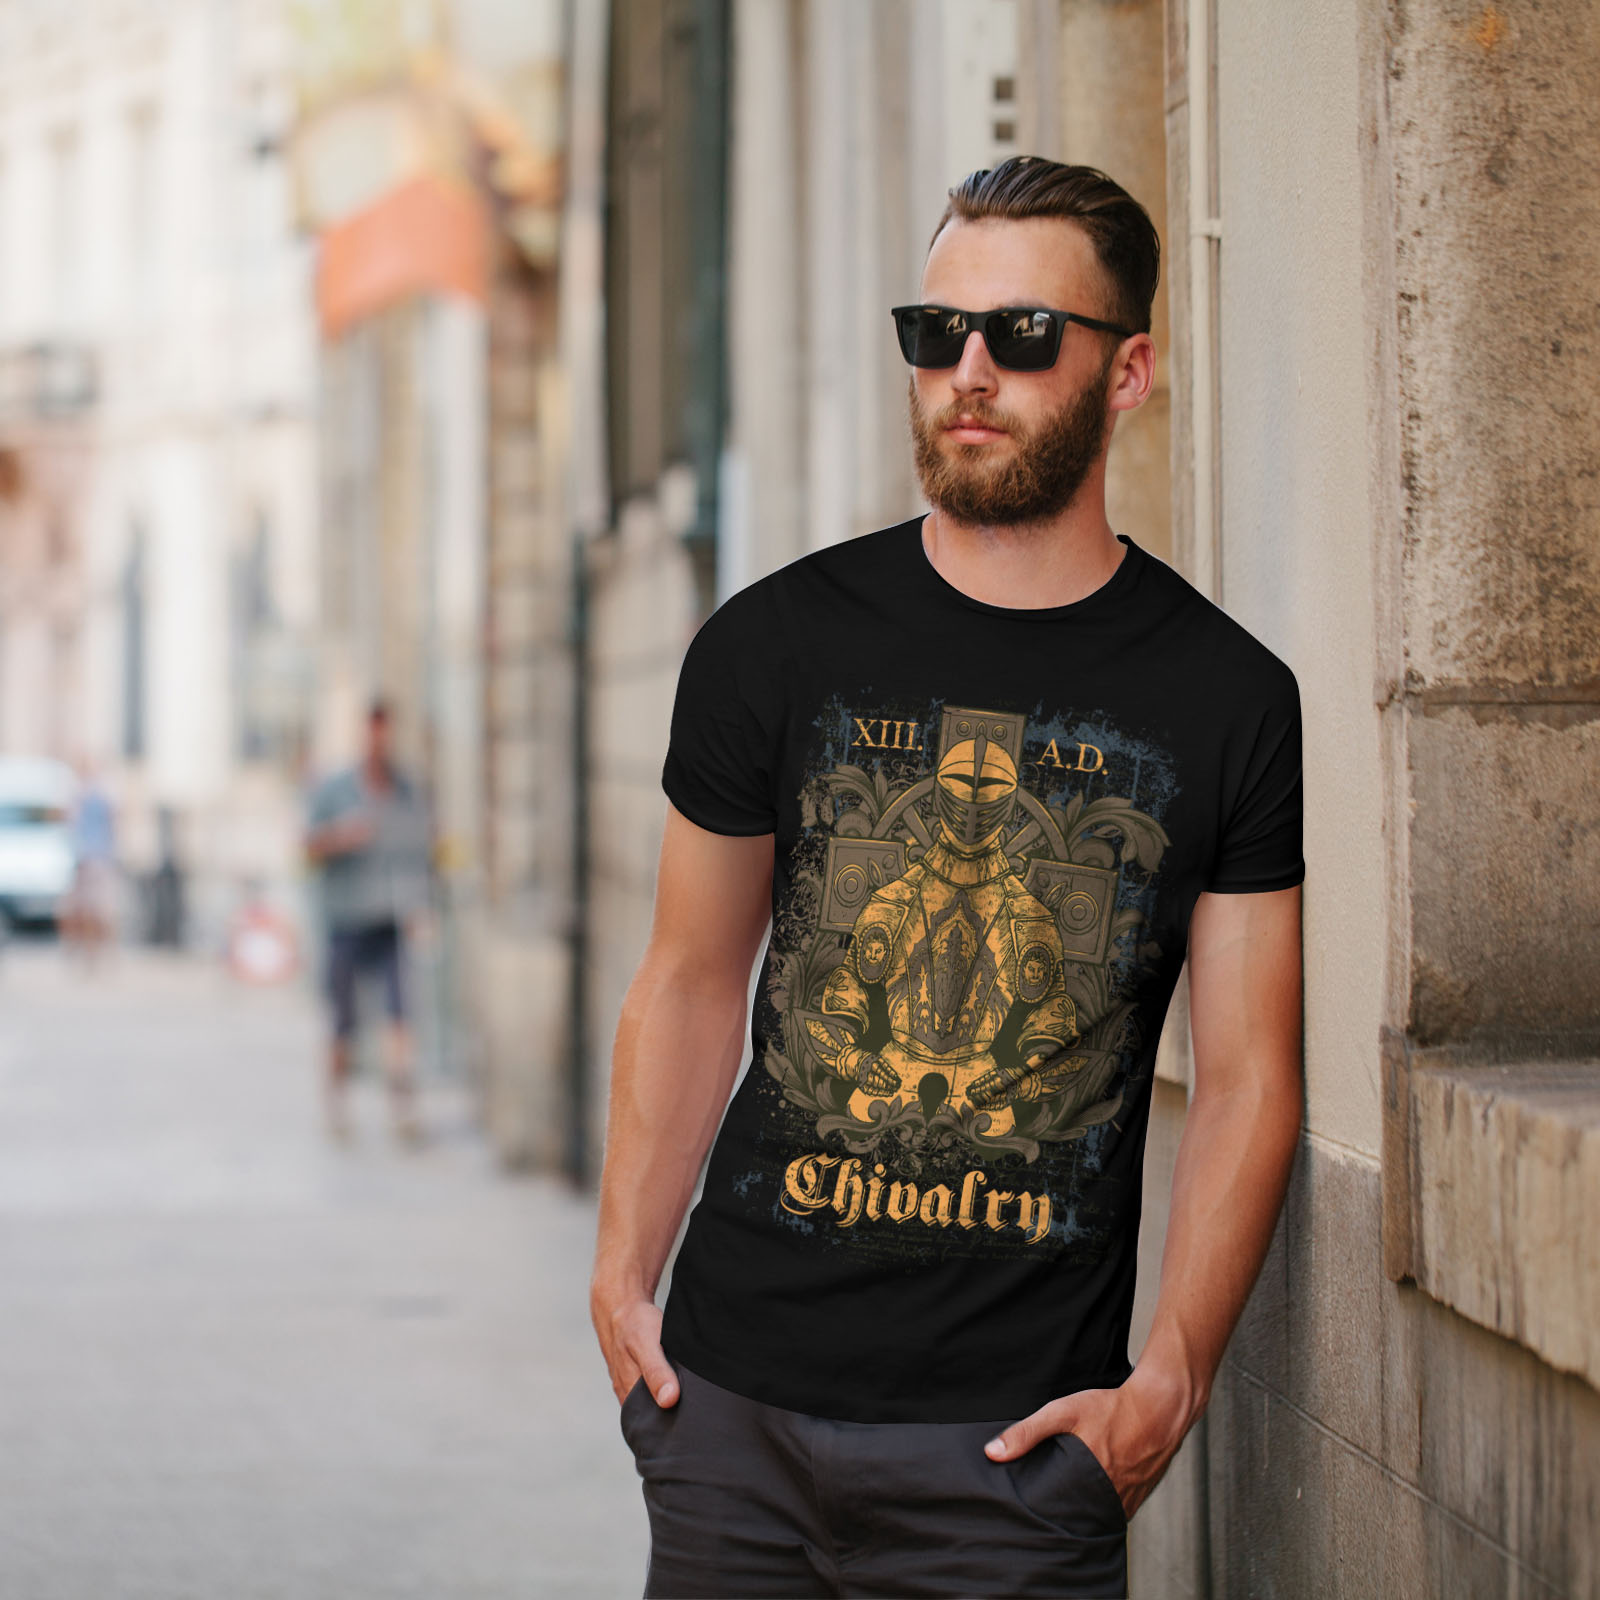 Armour Graphic Design Printed Tee Wellcoda Chivalry Knight Mens T-shirt